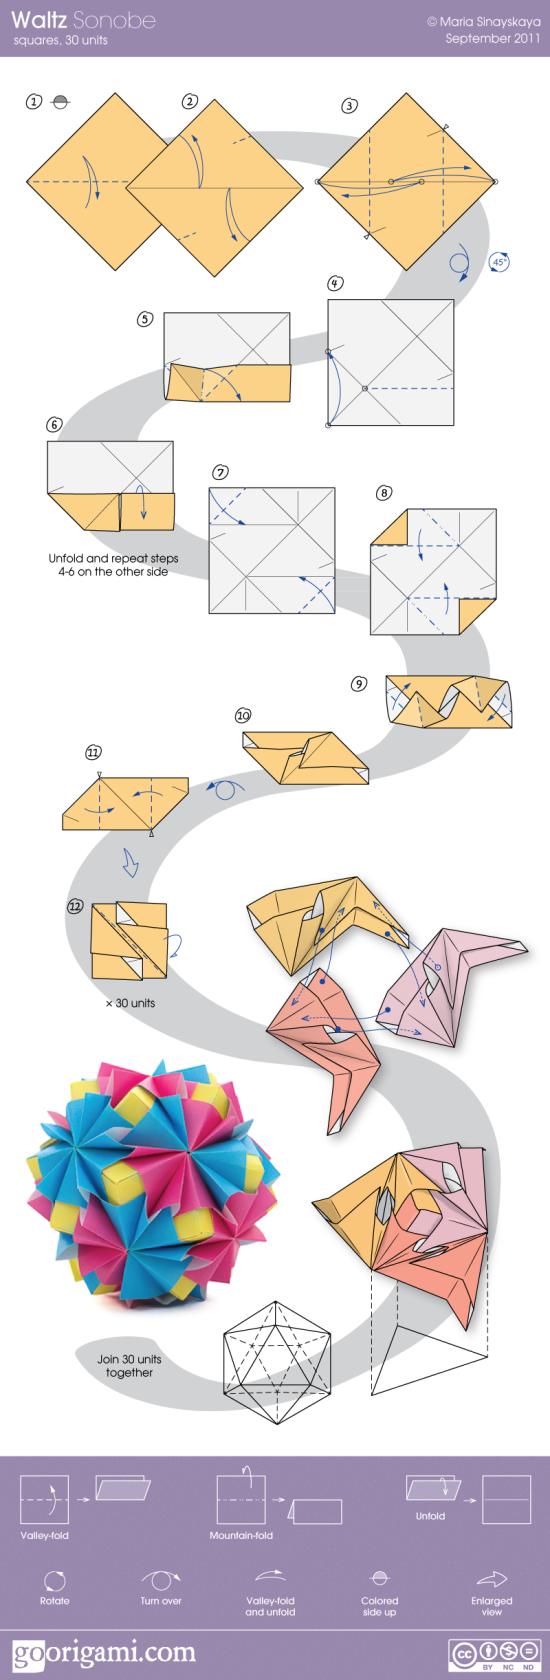 Waltz_Sonobe_diagram